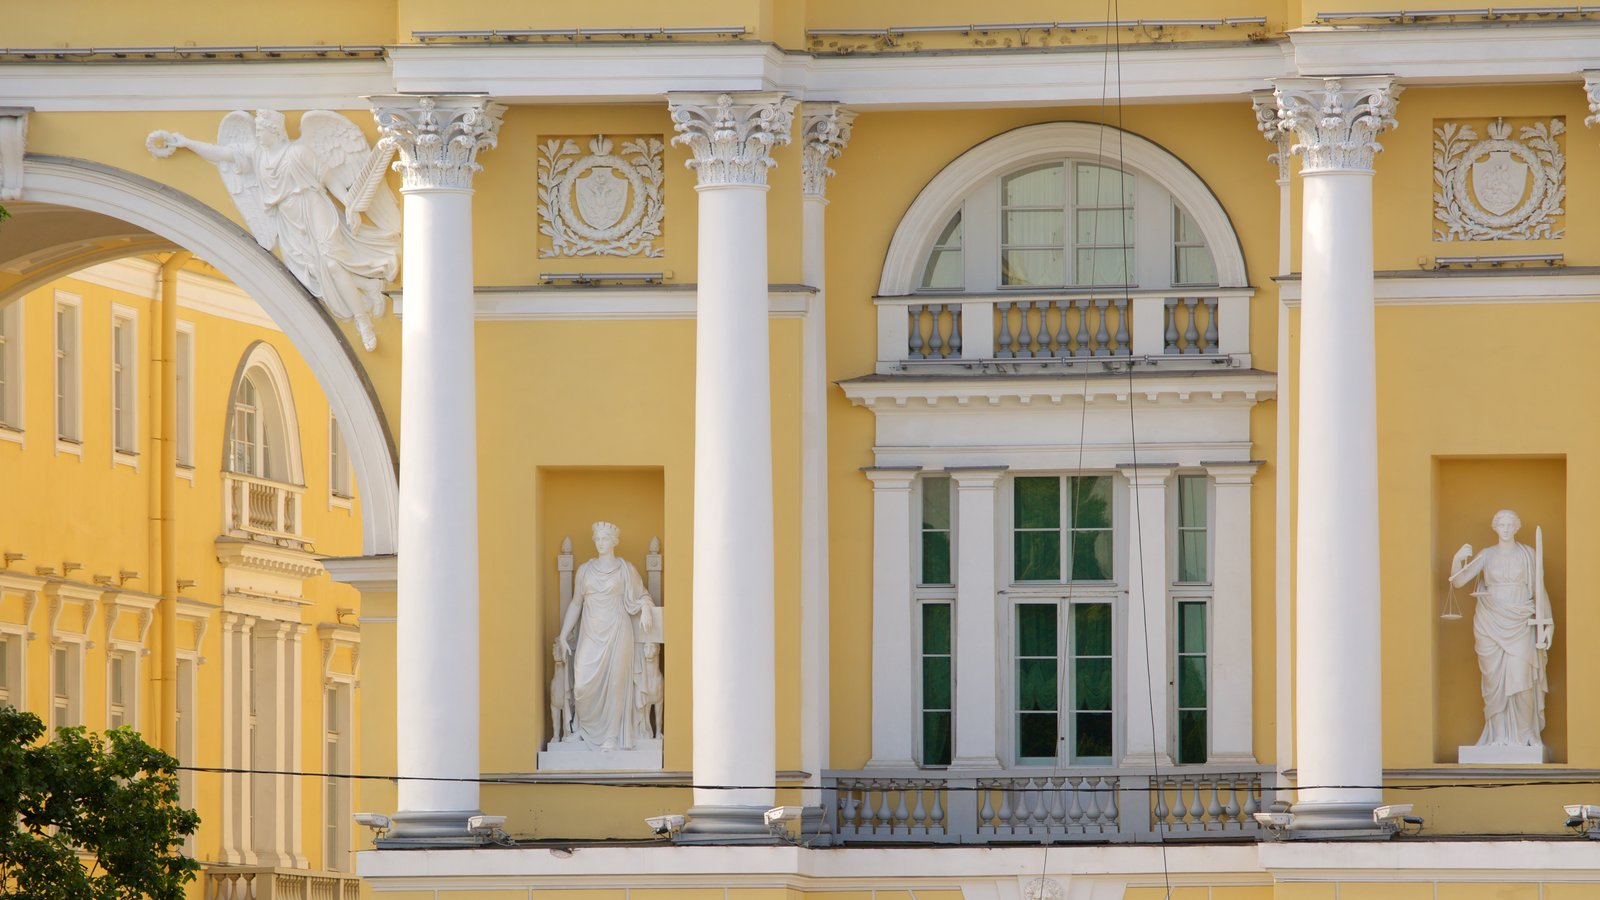 São Petersburgo caracterizando arquitetura de patrimônio